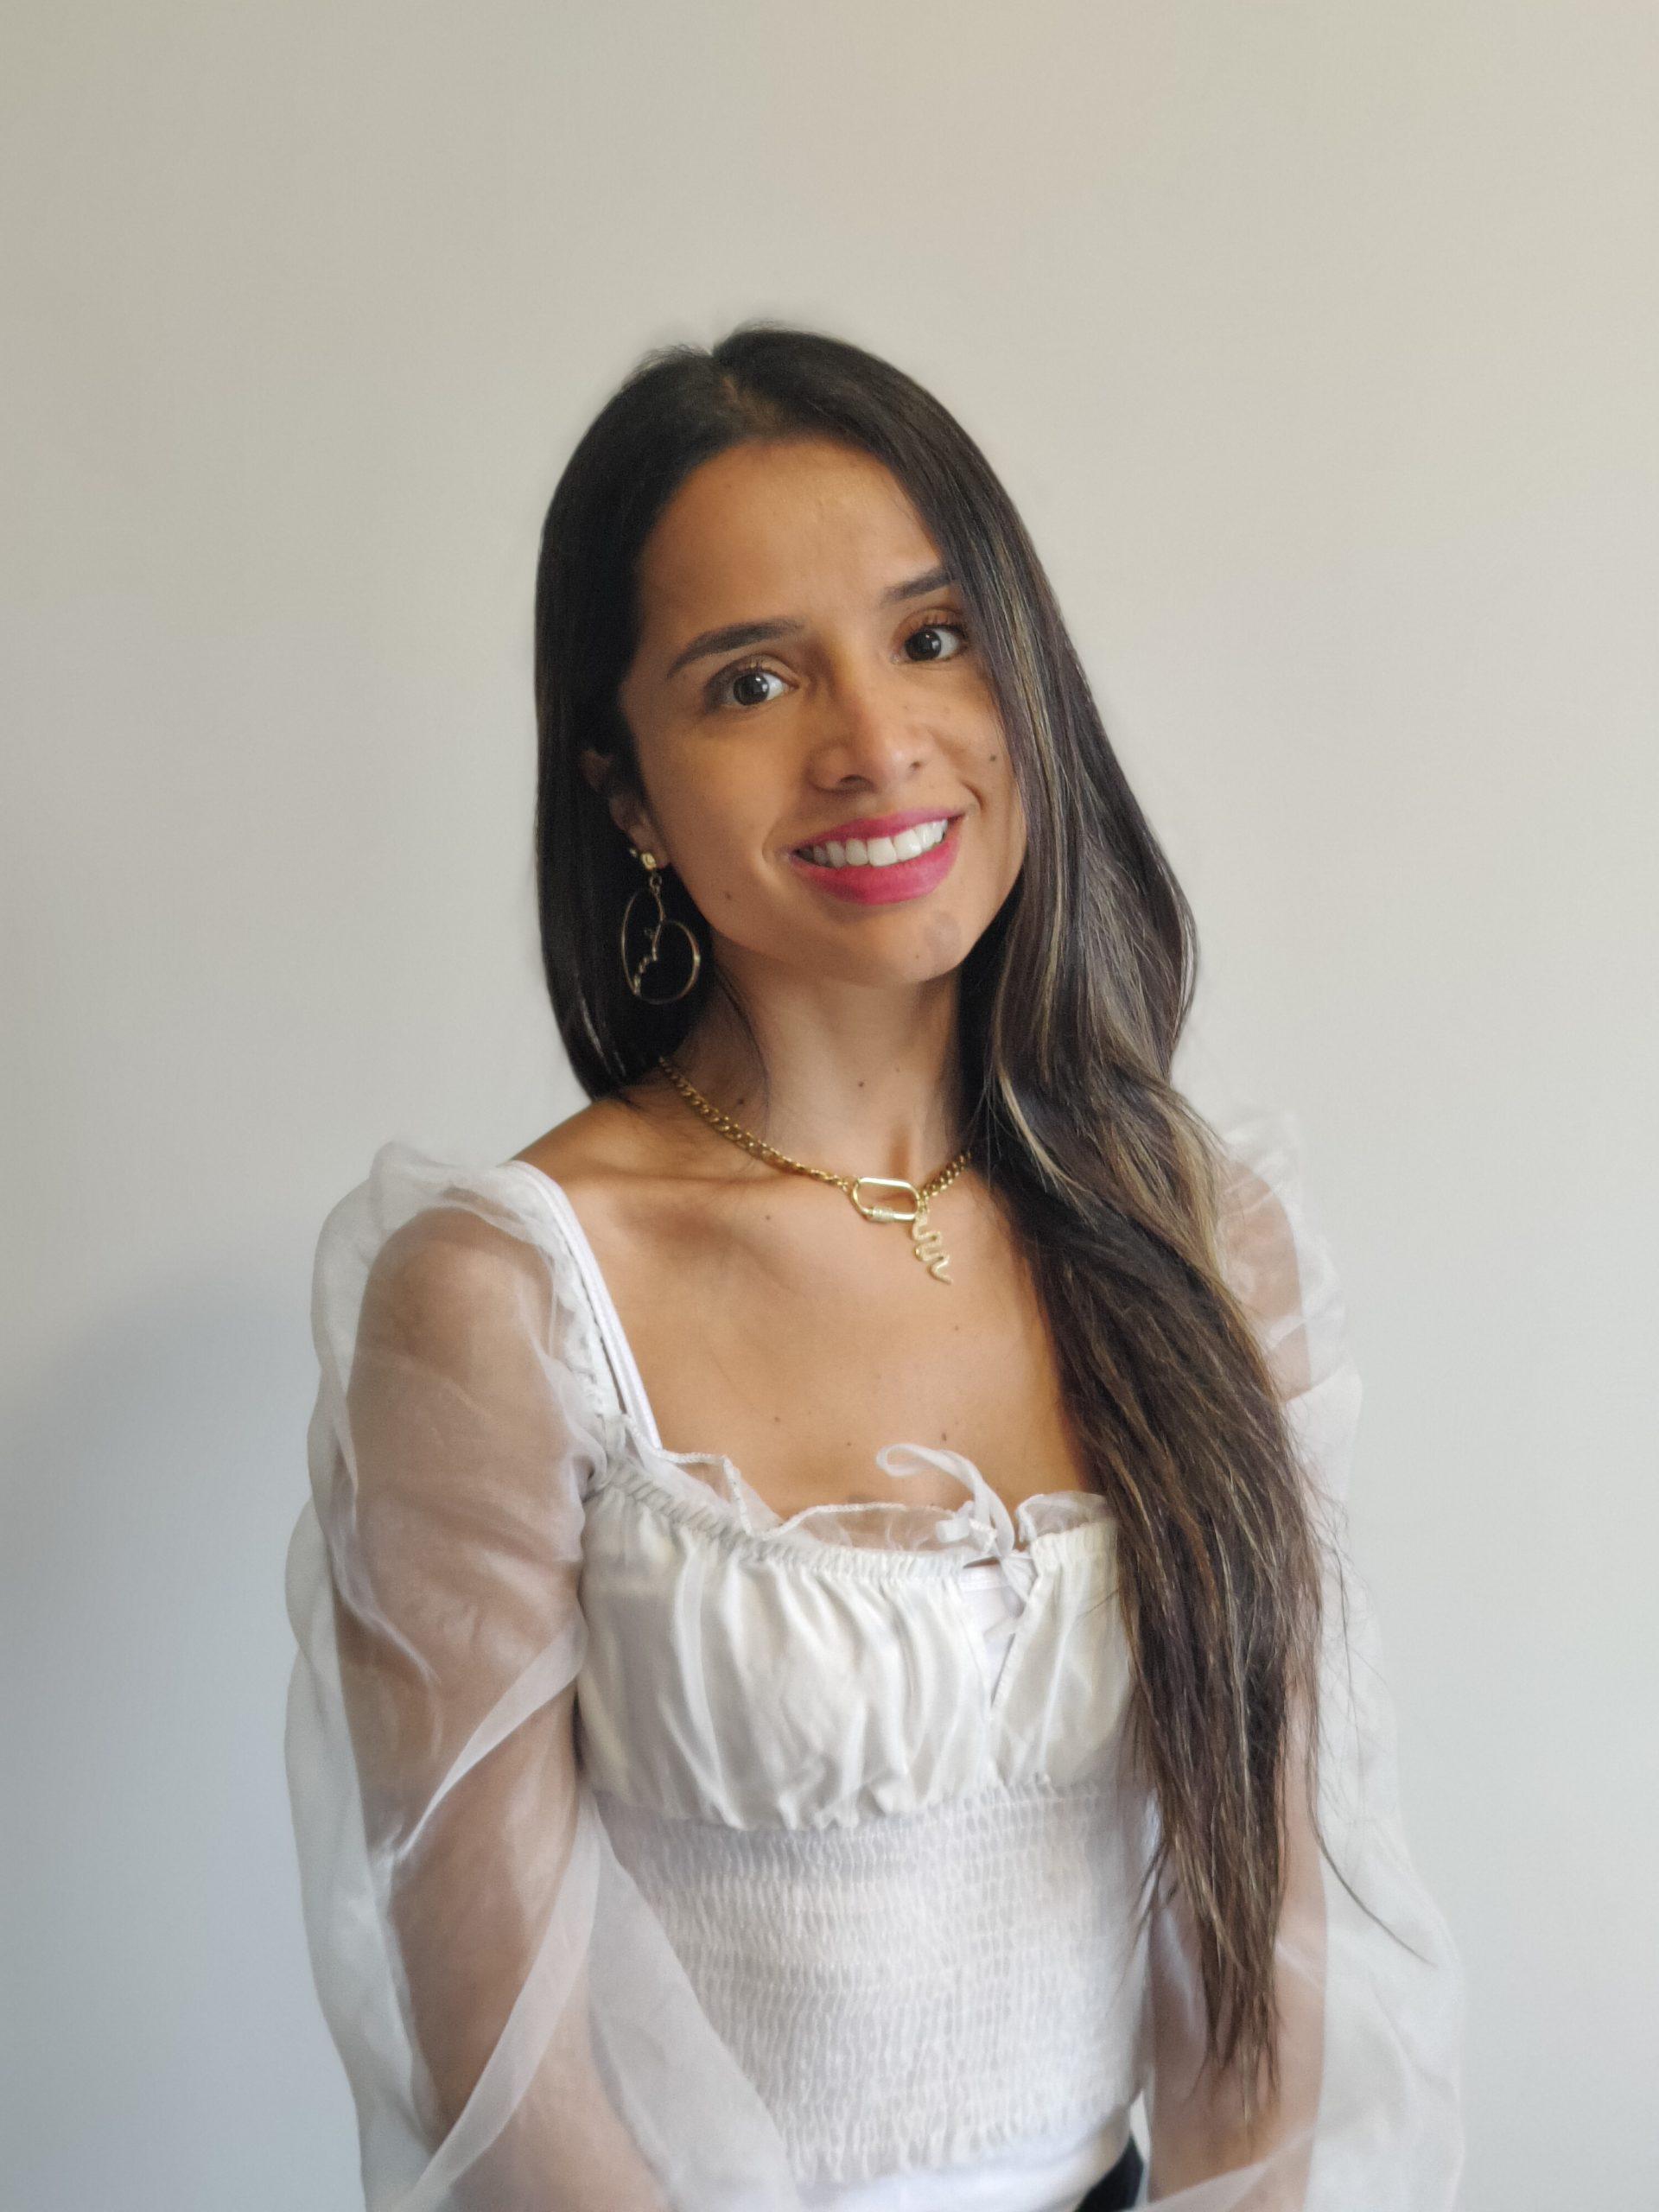 Marisol Mata Somarribas